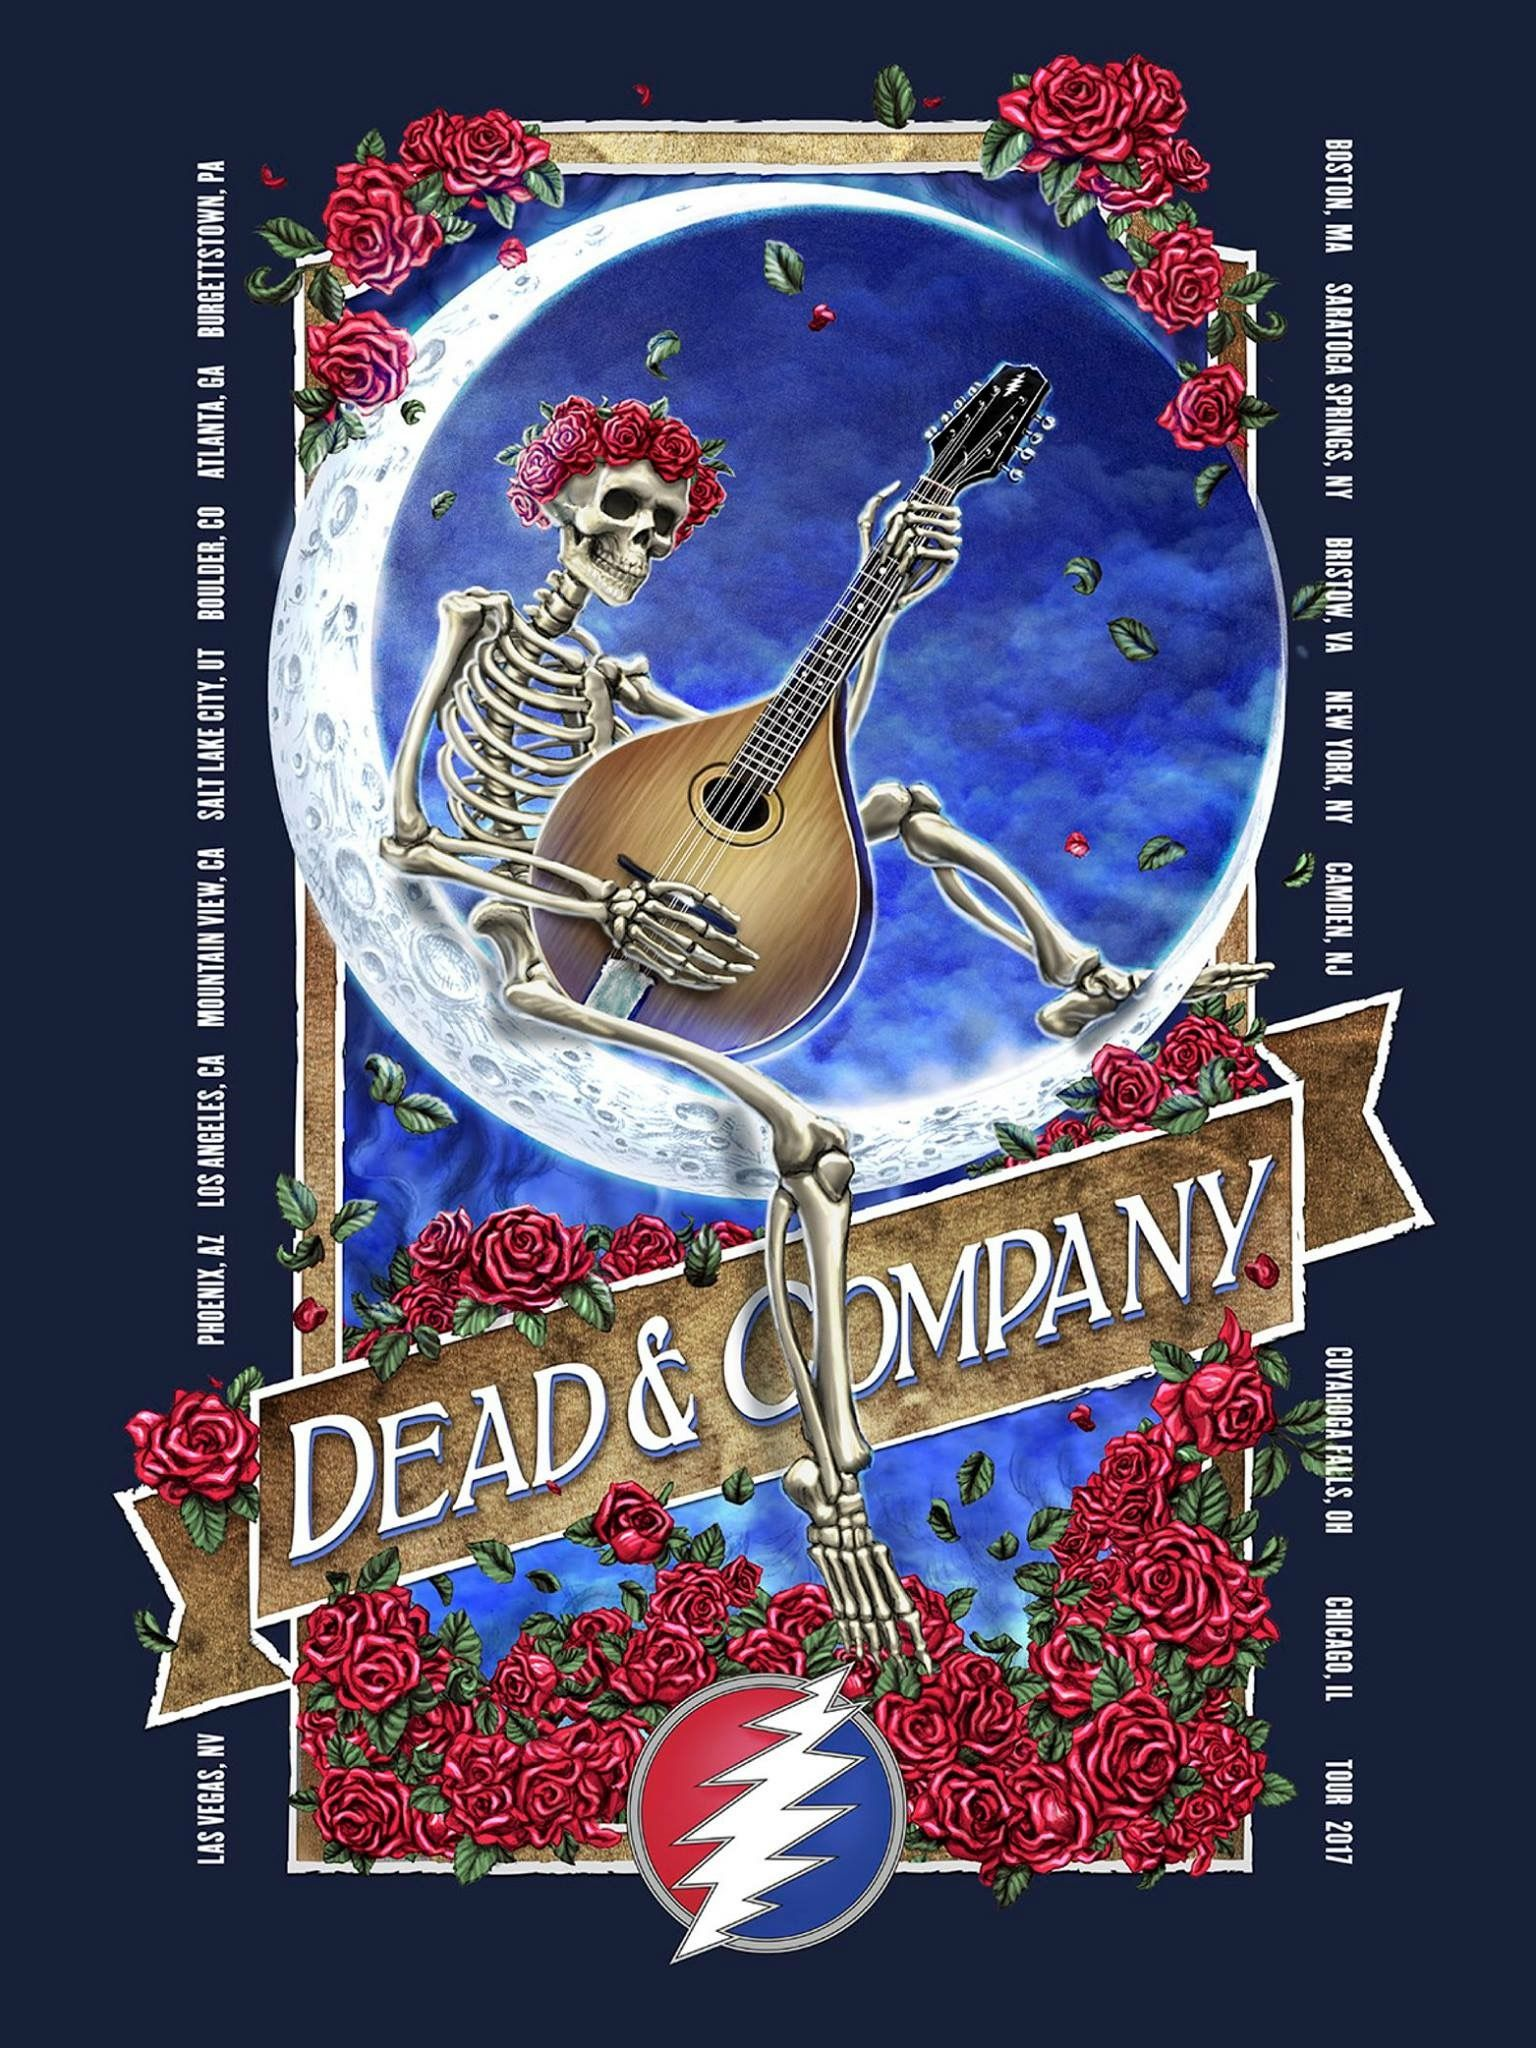 Pin By Lisa Scott Lozano On Dead Co Grateful Dead Wallpaper Grateful Dead Poster Dead And Company